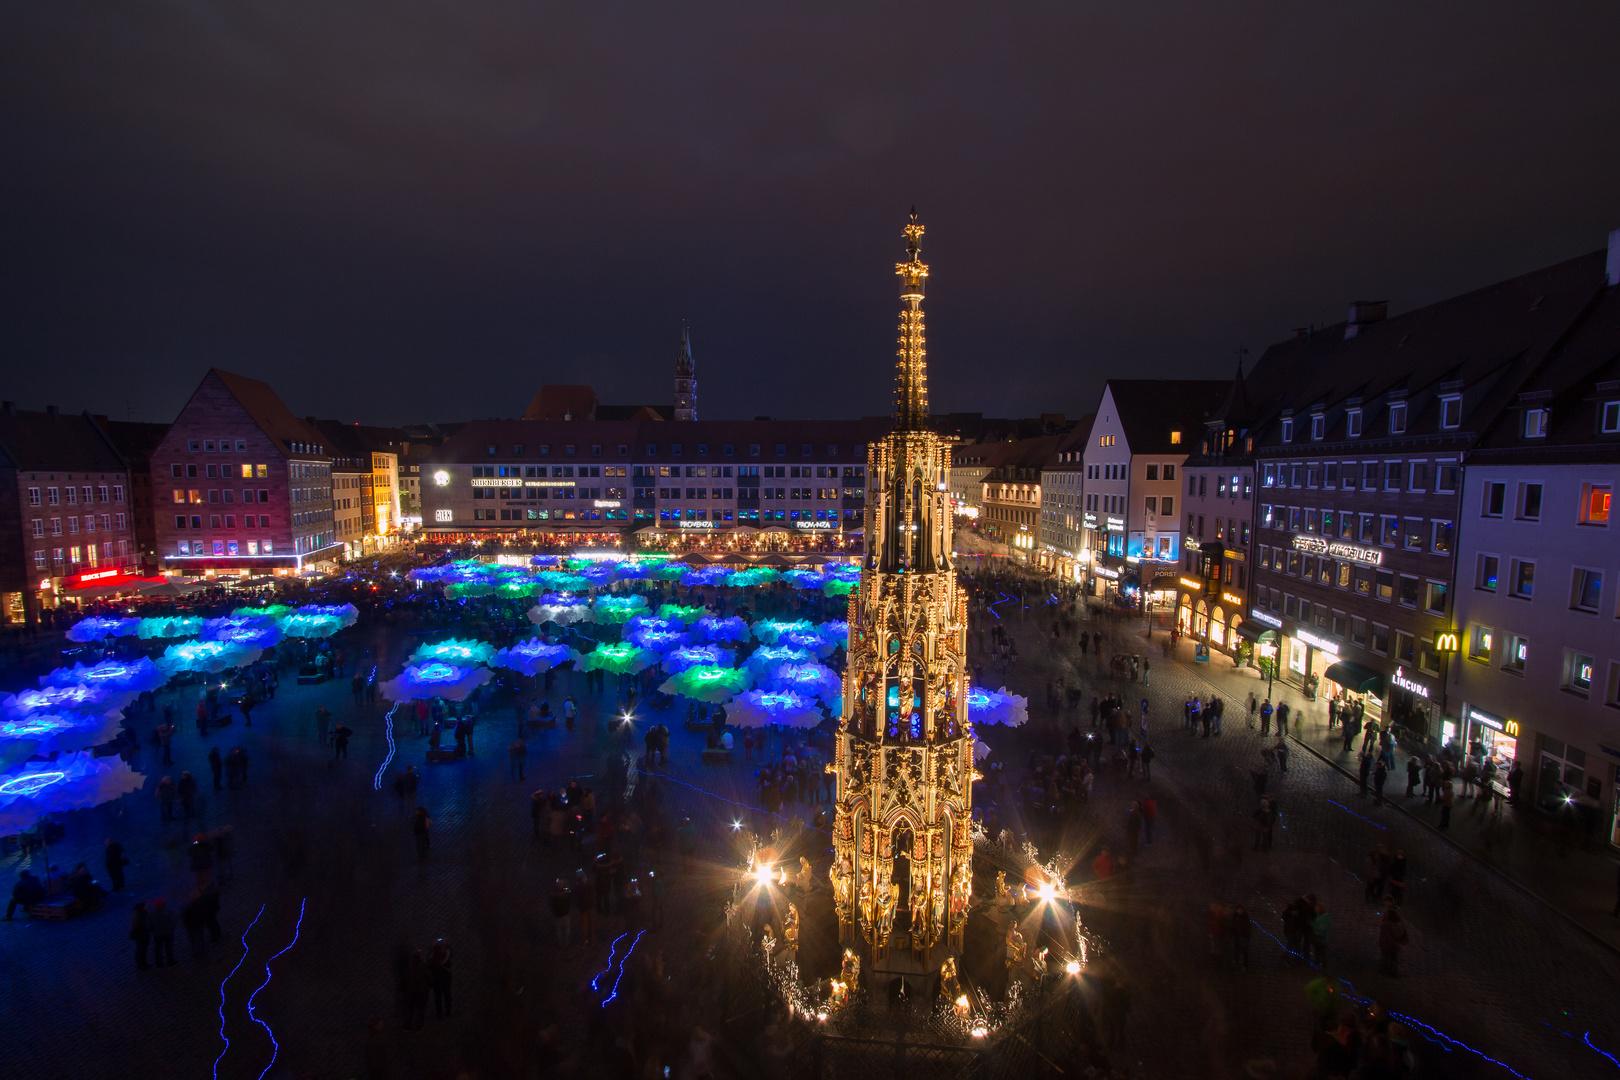 Blaue Nacht in Nürnberg 2014